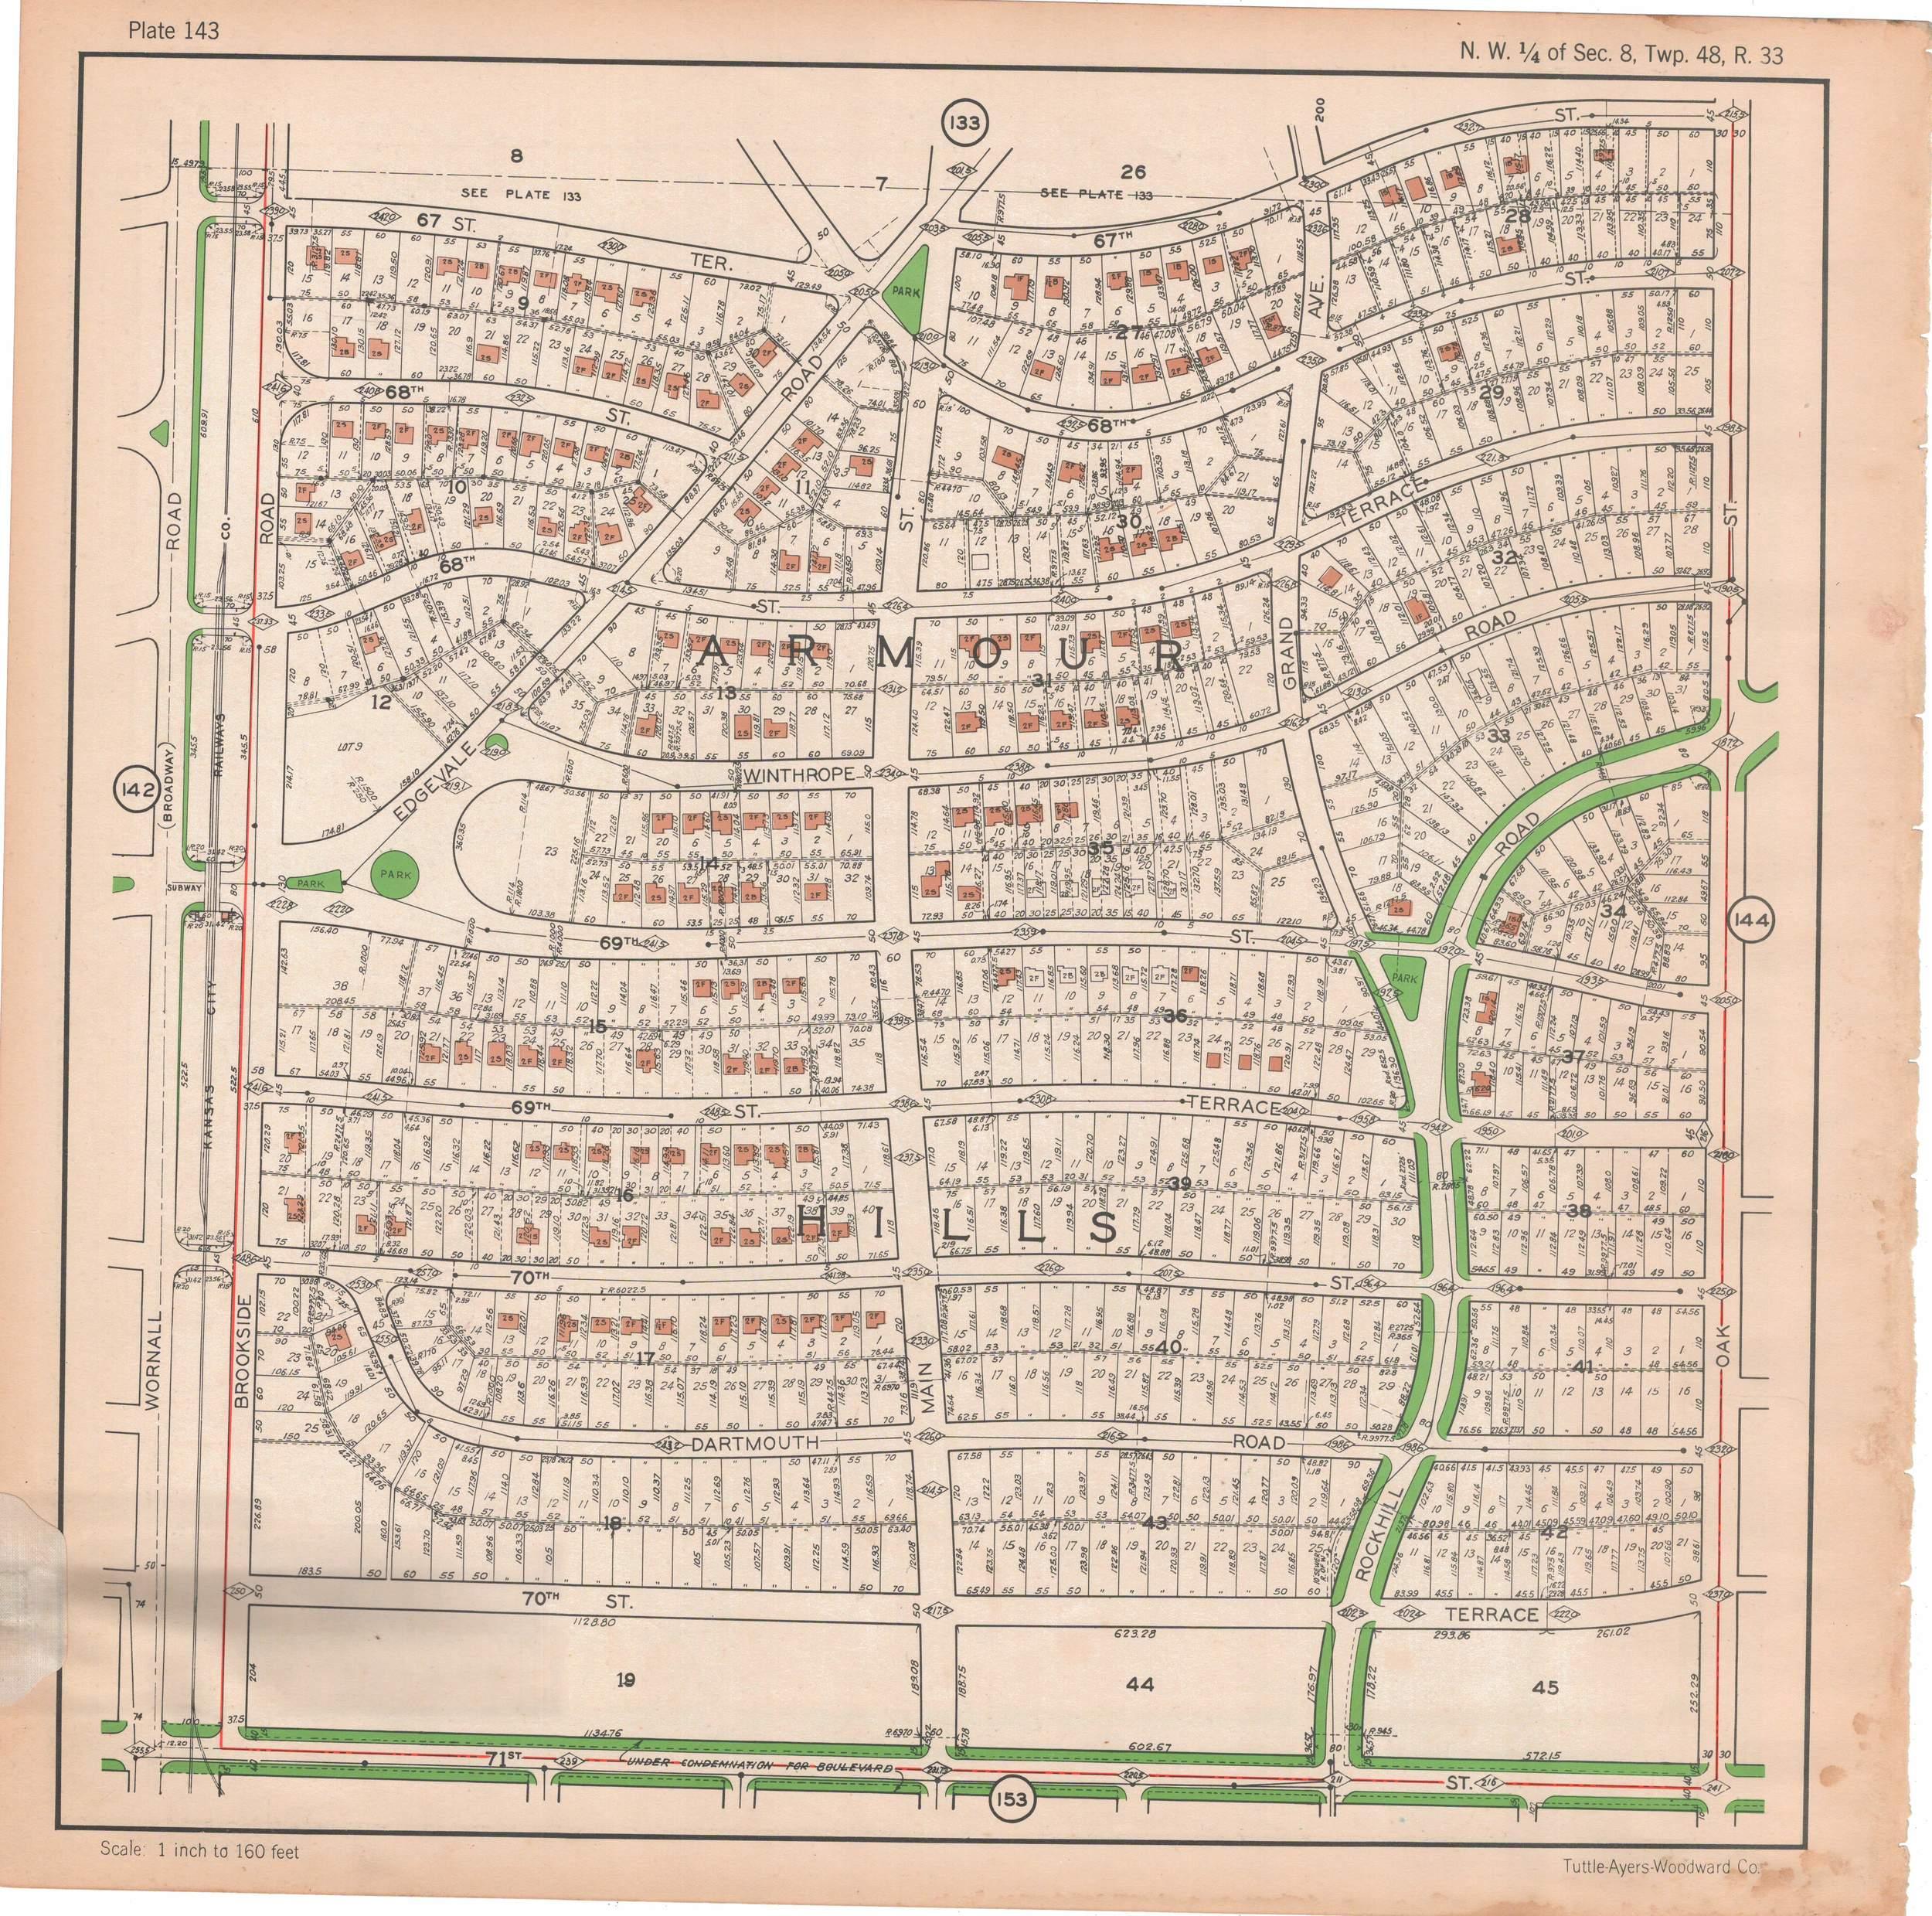 1925 TUTTLE_AYERS_Plate_143.JPG